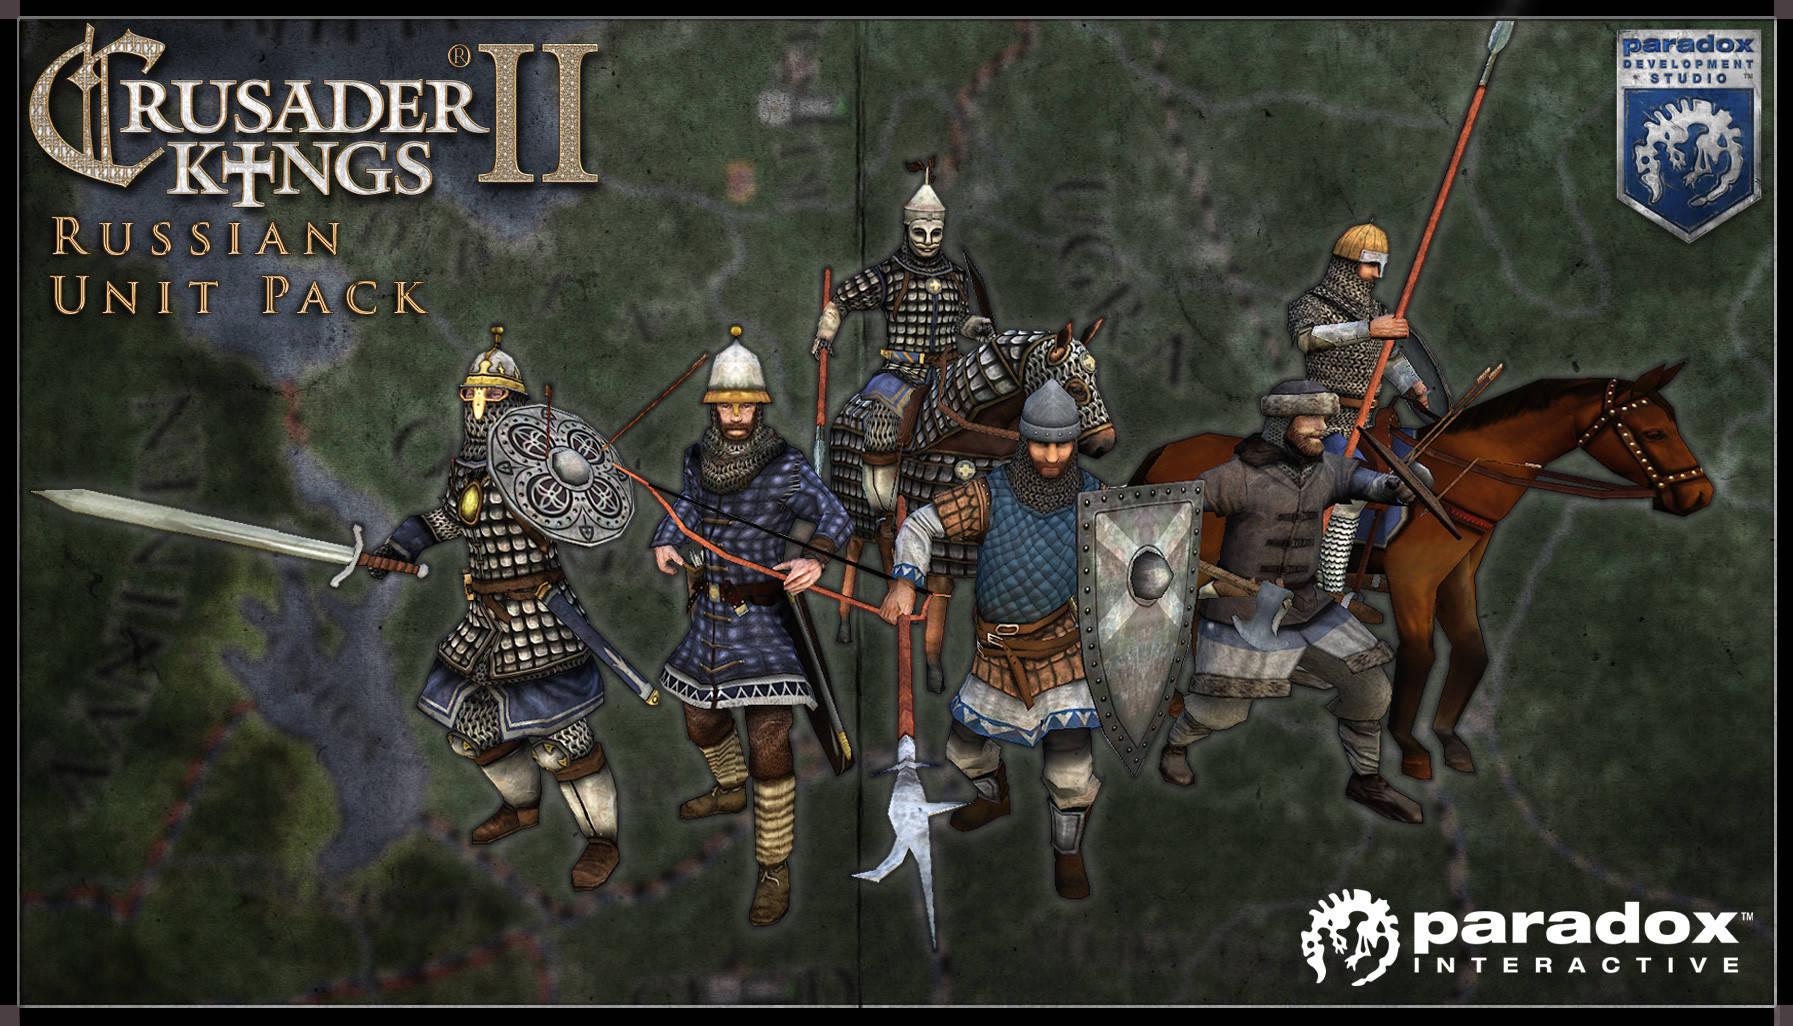 Pagans Crusader Kings Ii Wiki - HD1793×1026